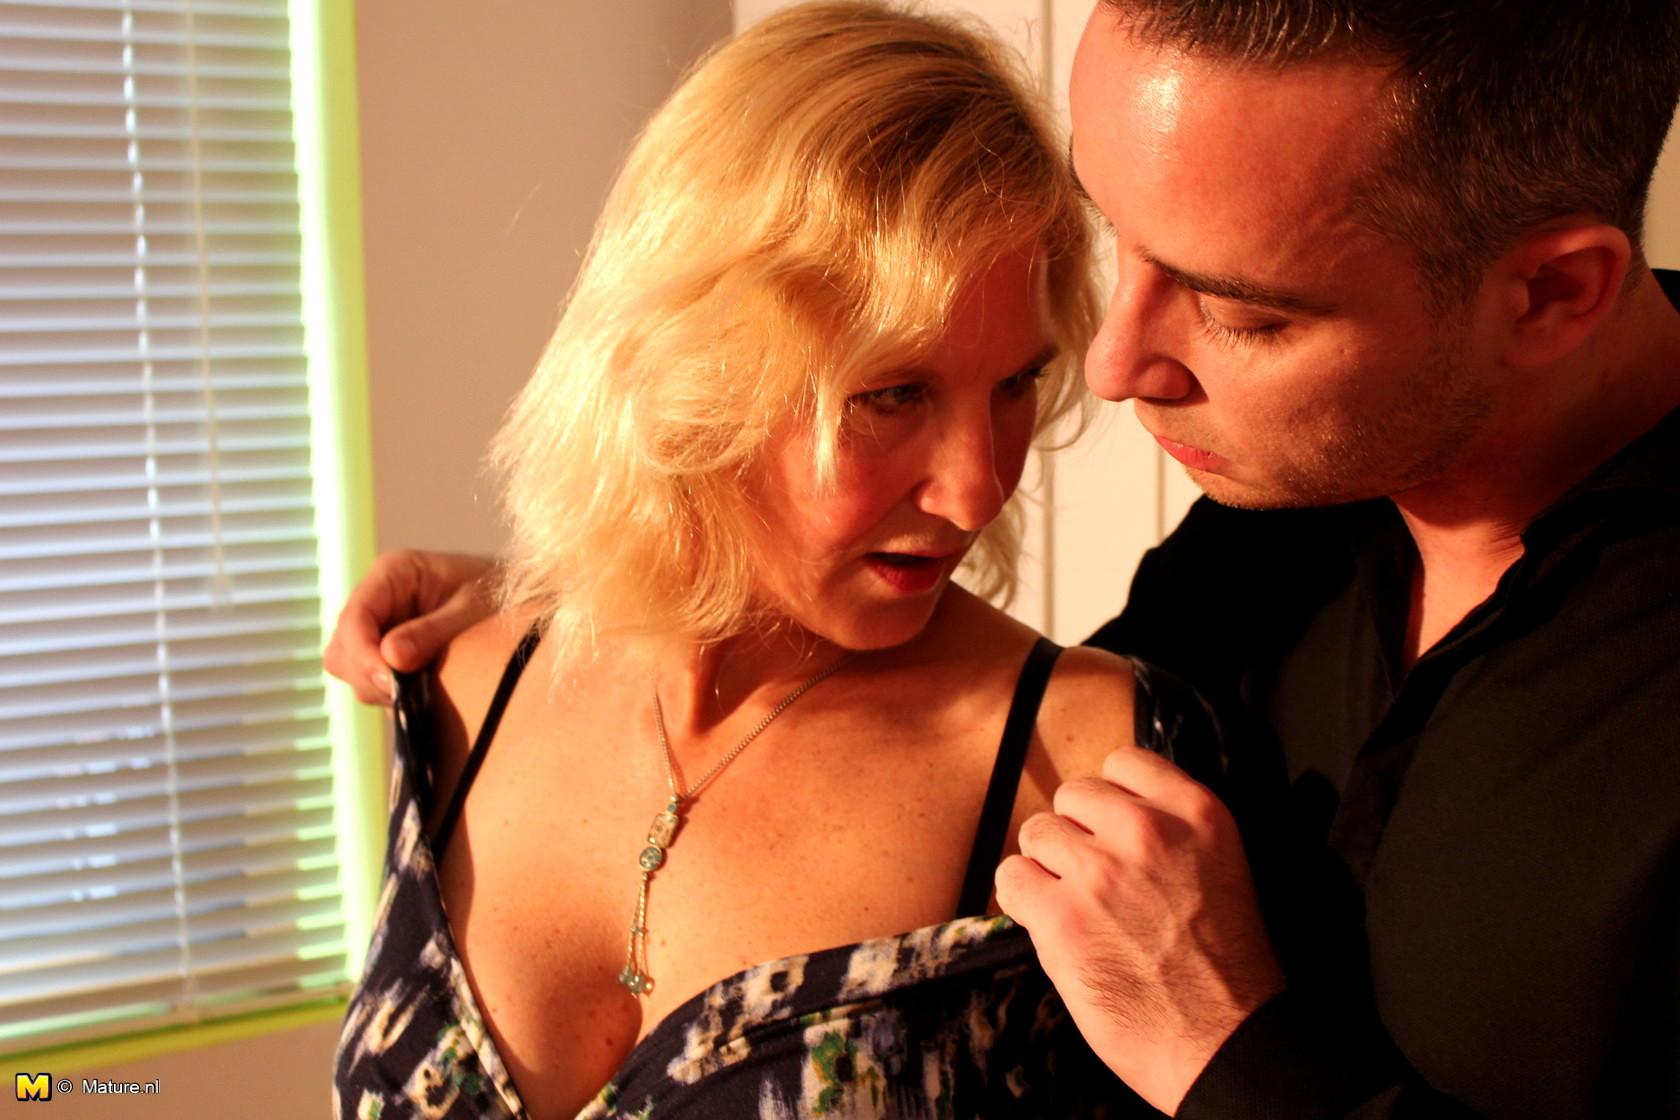 seduced-mature-women-young-men-singles-party